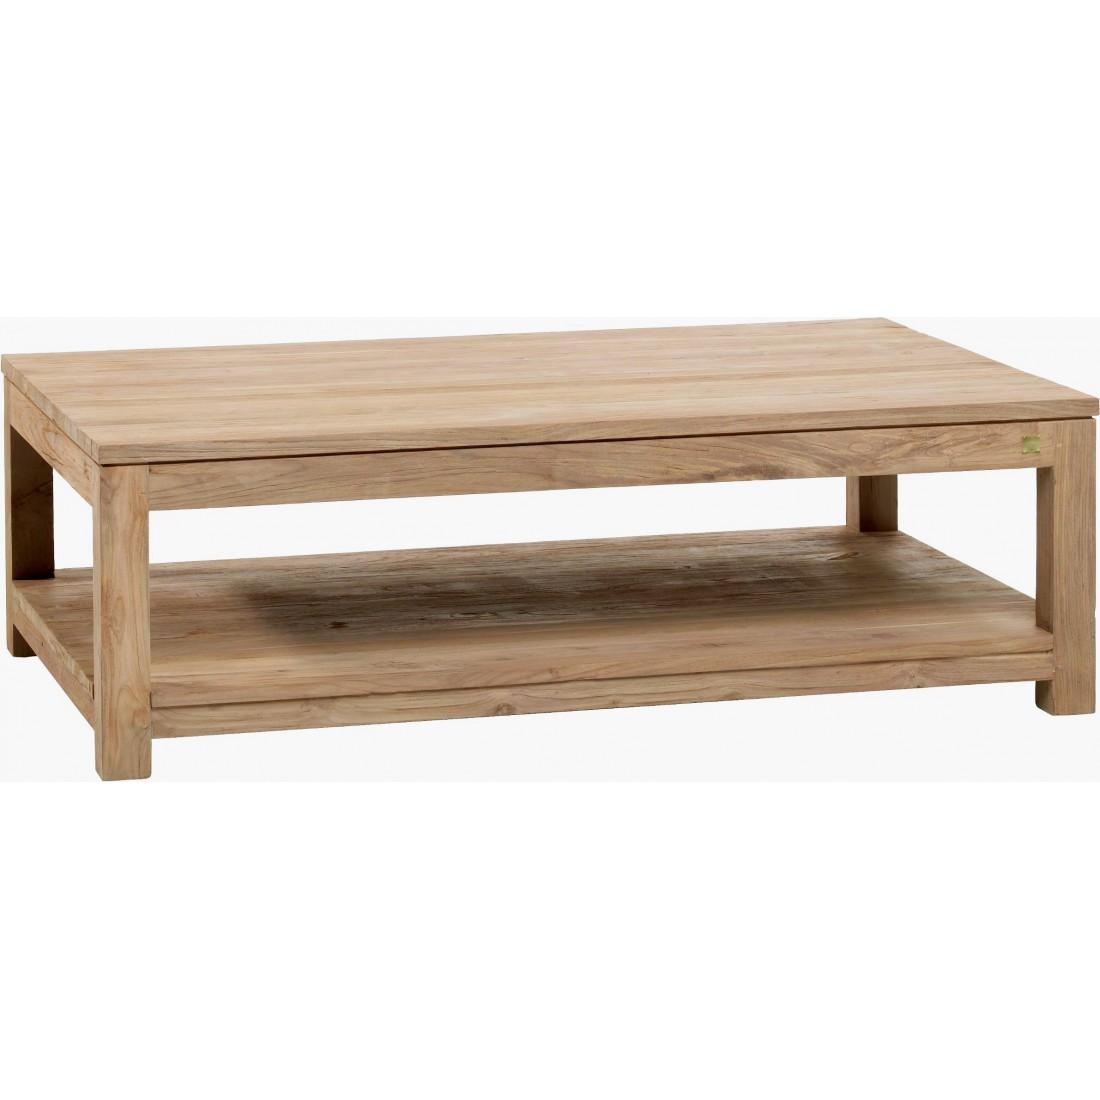 Teak coffee table drift 130x80 for Coussin exterieur 55x55